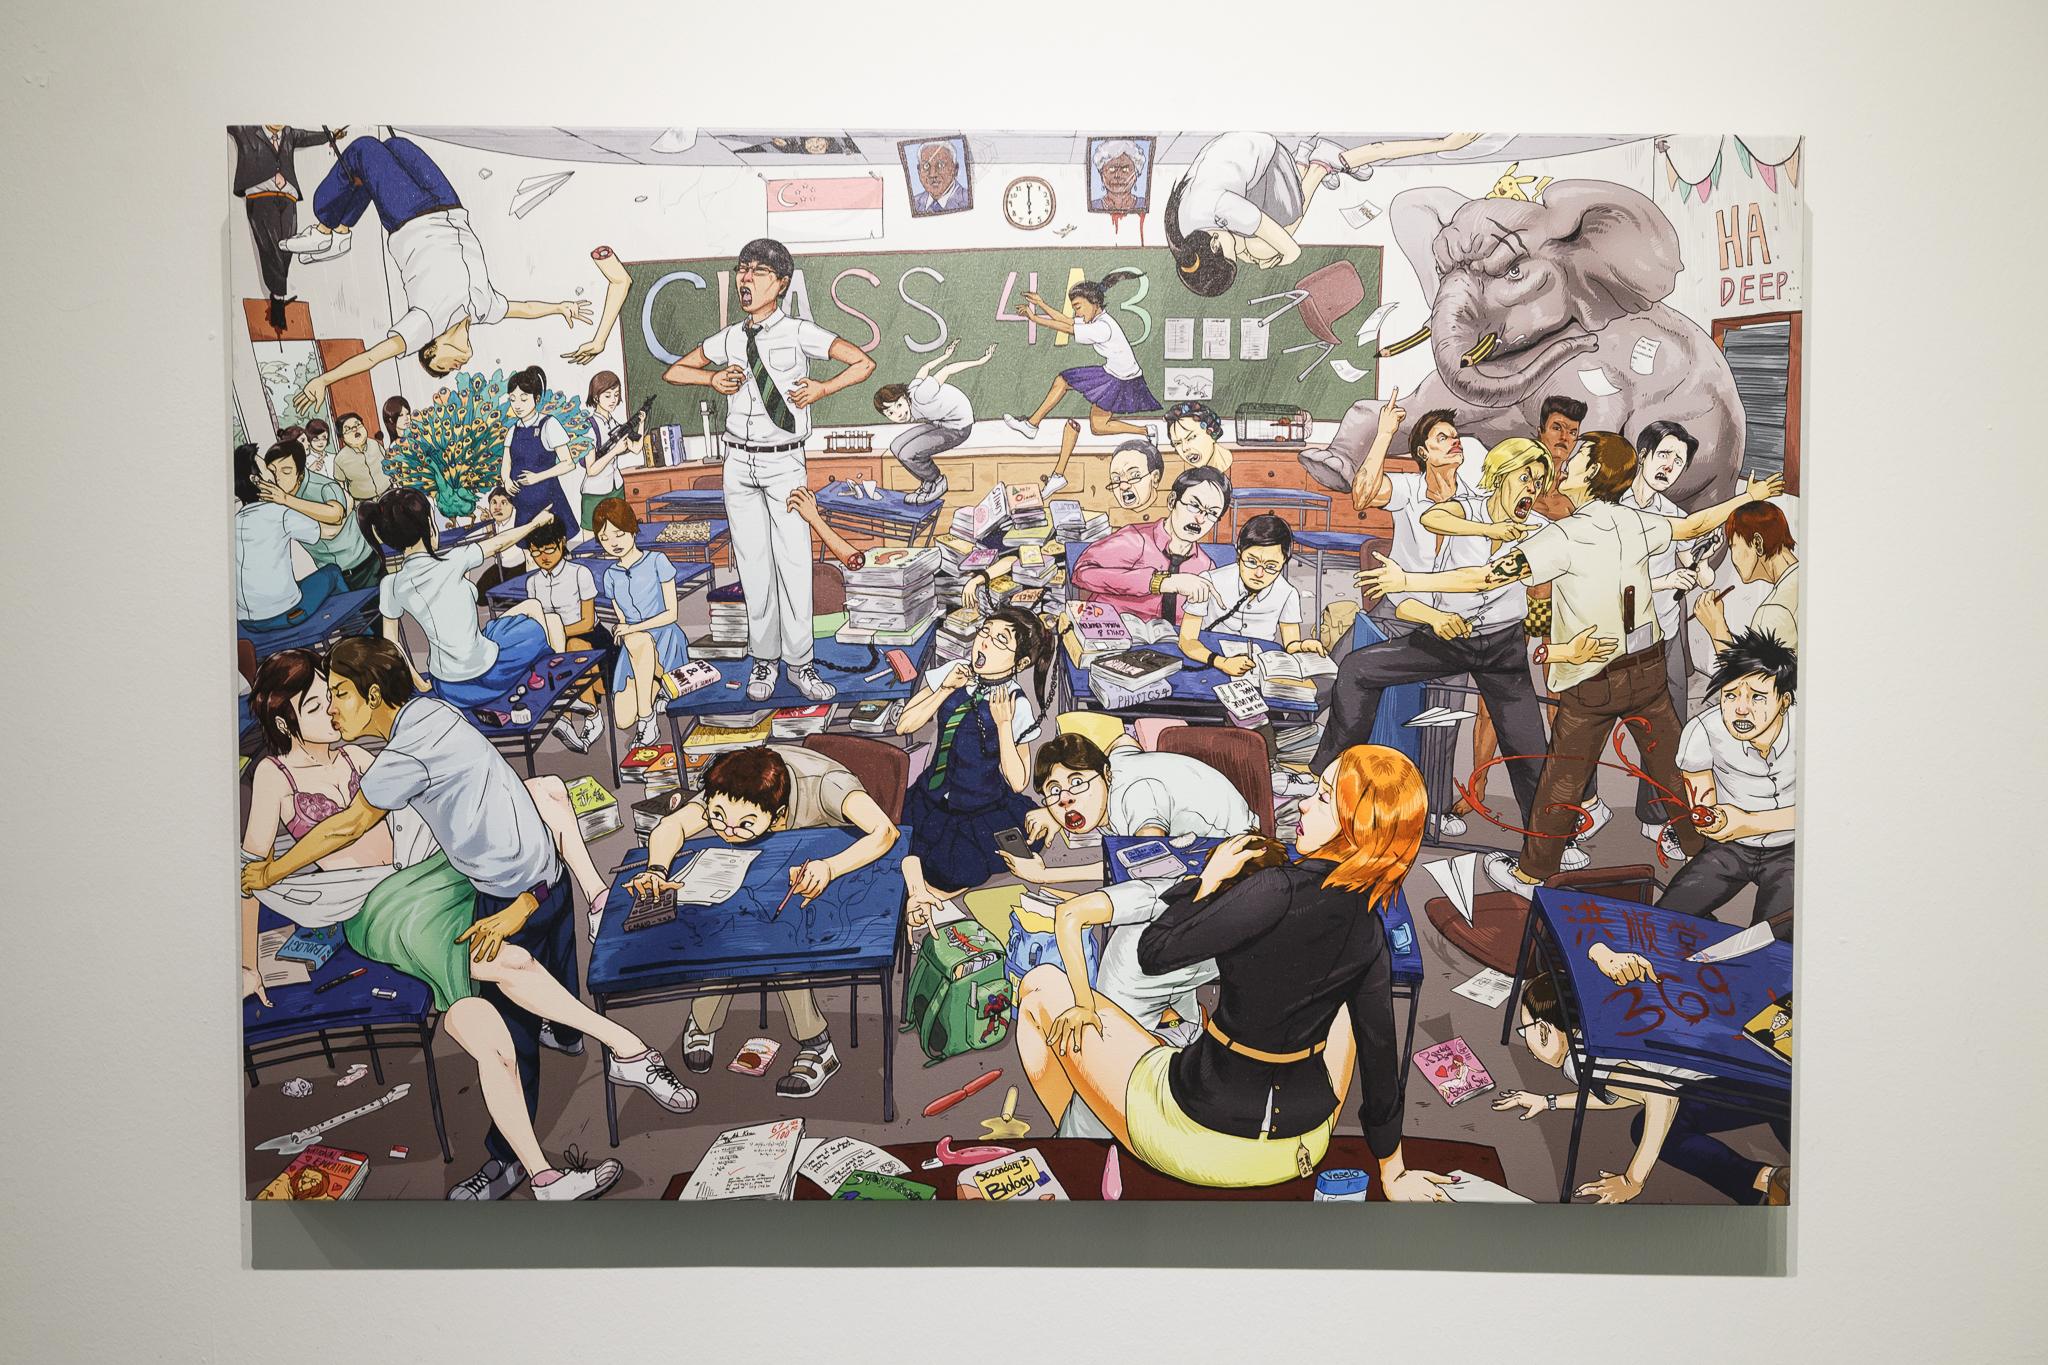 Dan Wong, Emmohee (MOE), 2013, Digital print on archival canvas